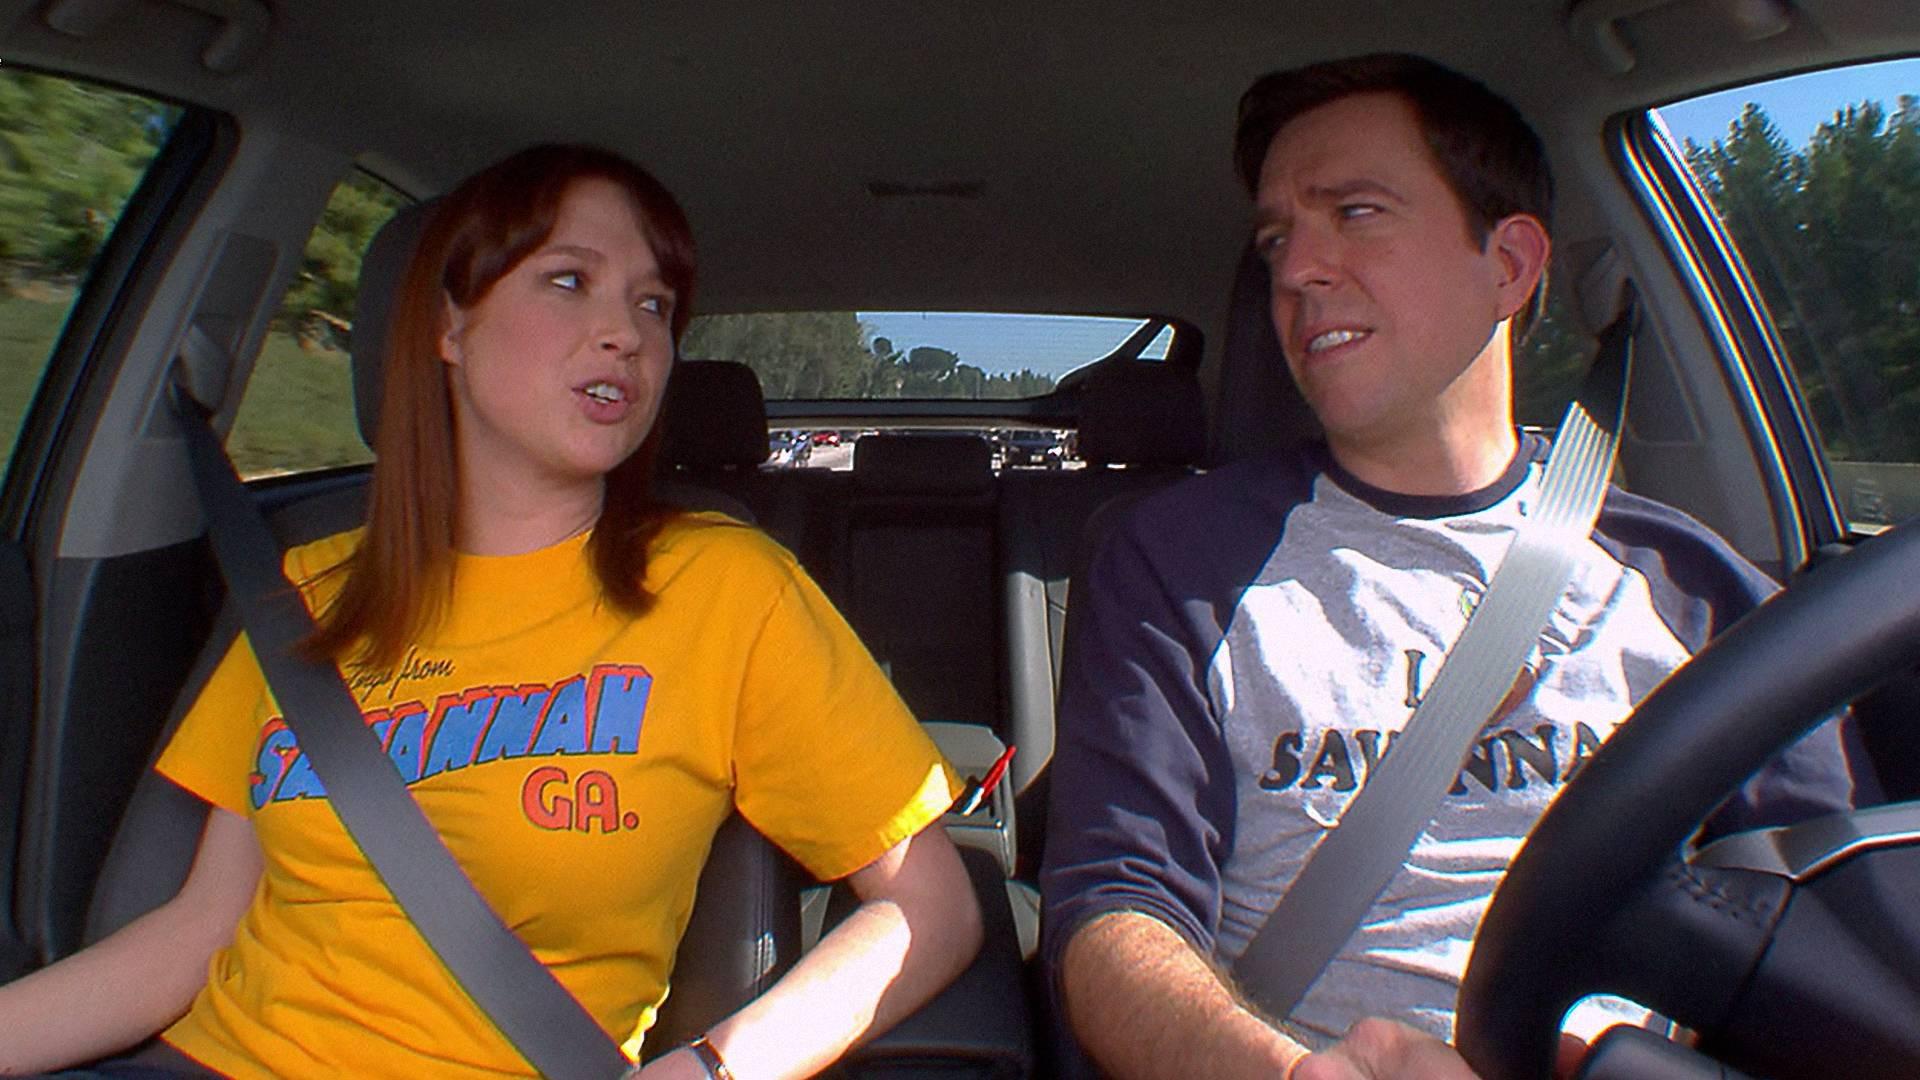 The Office Season 8 Episode 20